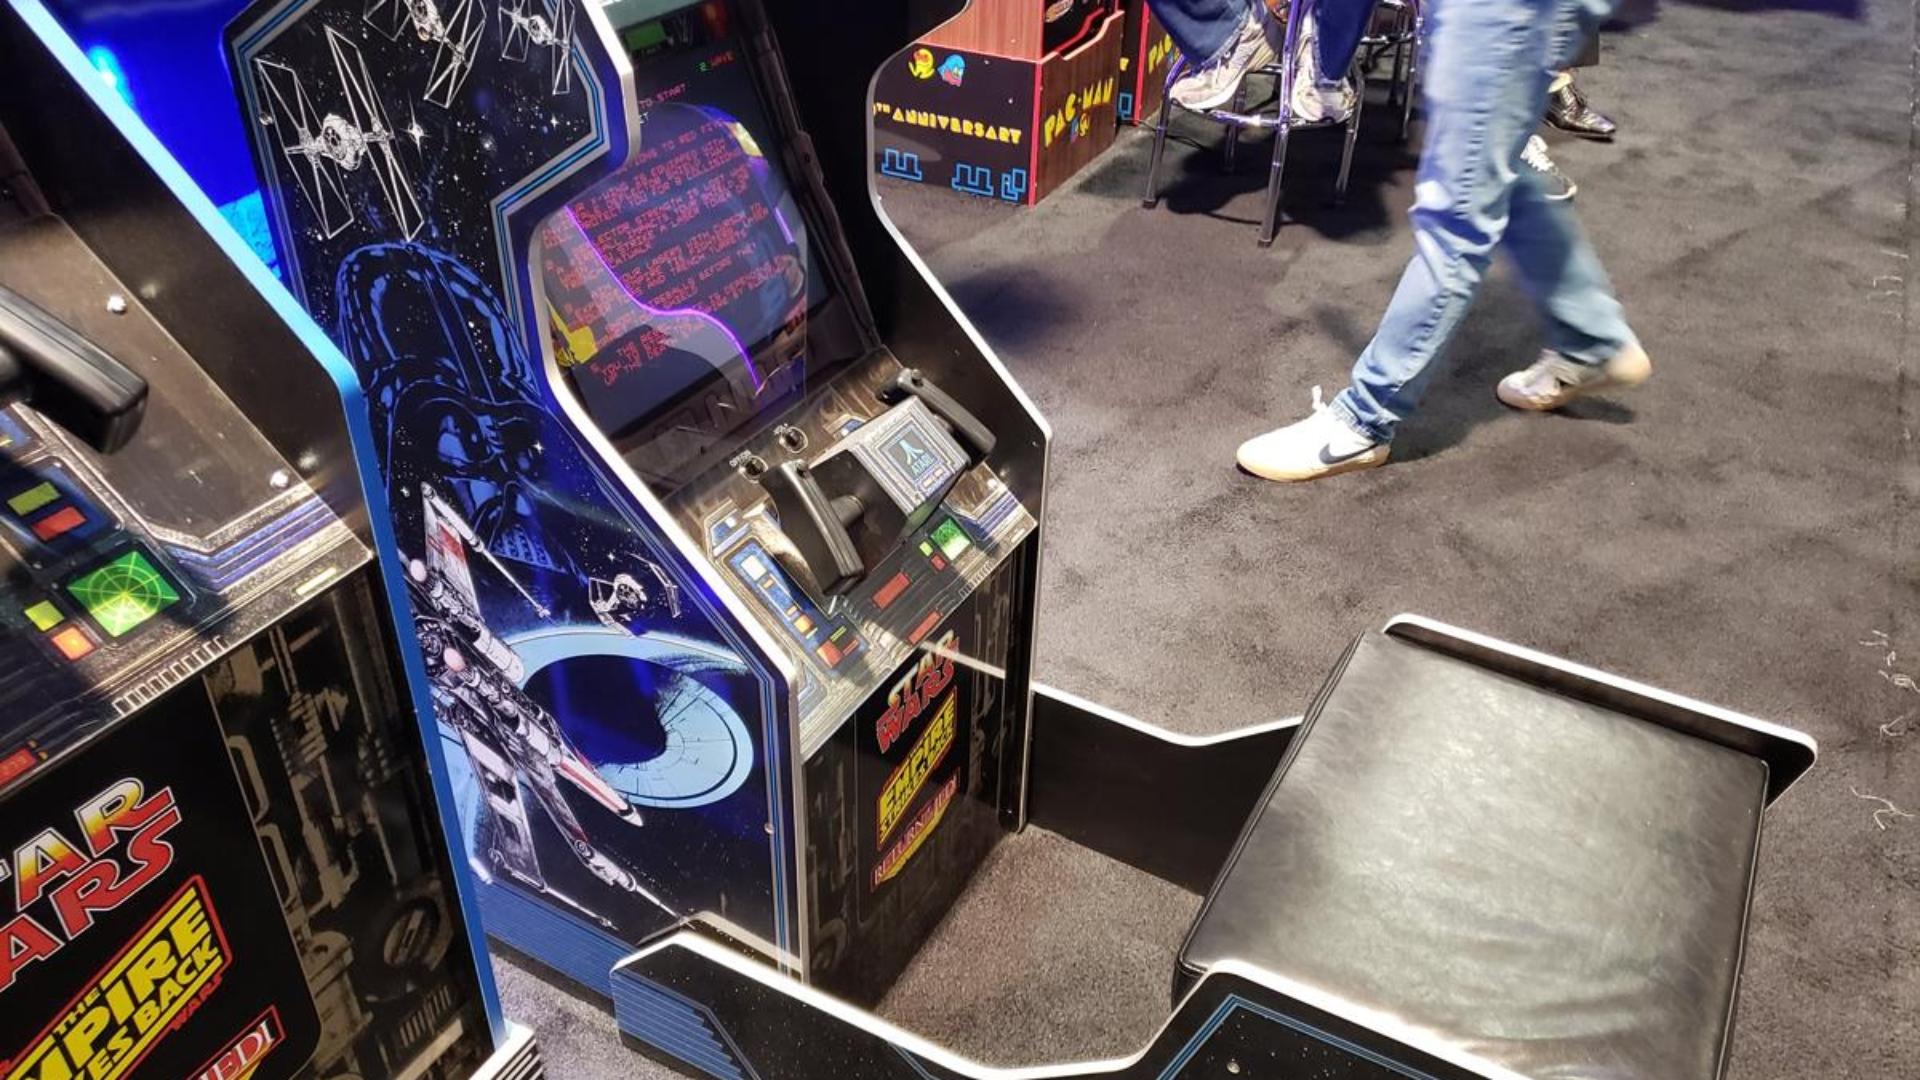 arcade 1up cabinets_star wars arcade